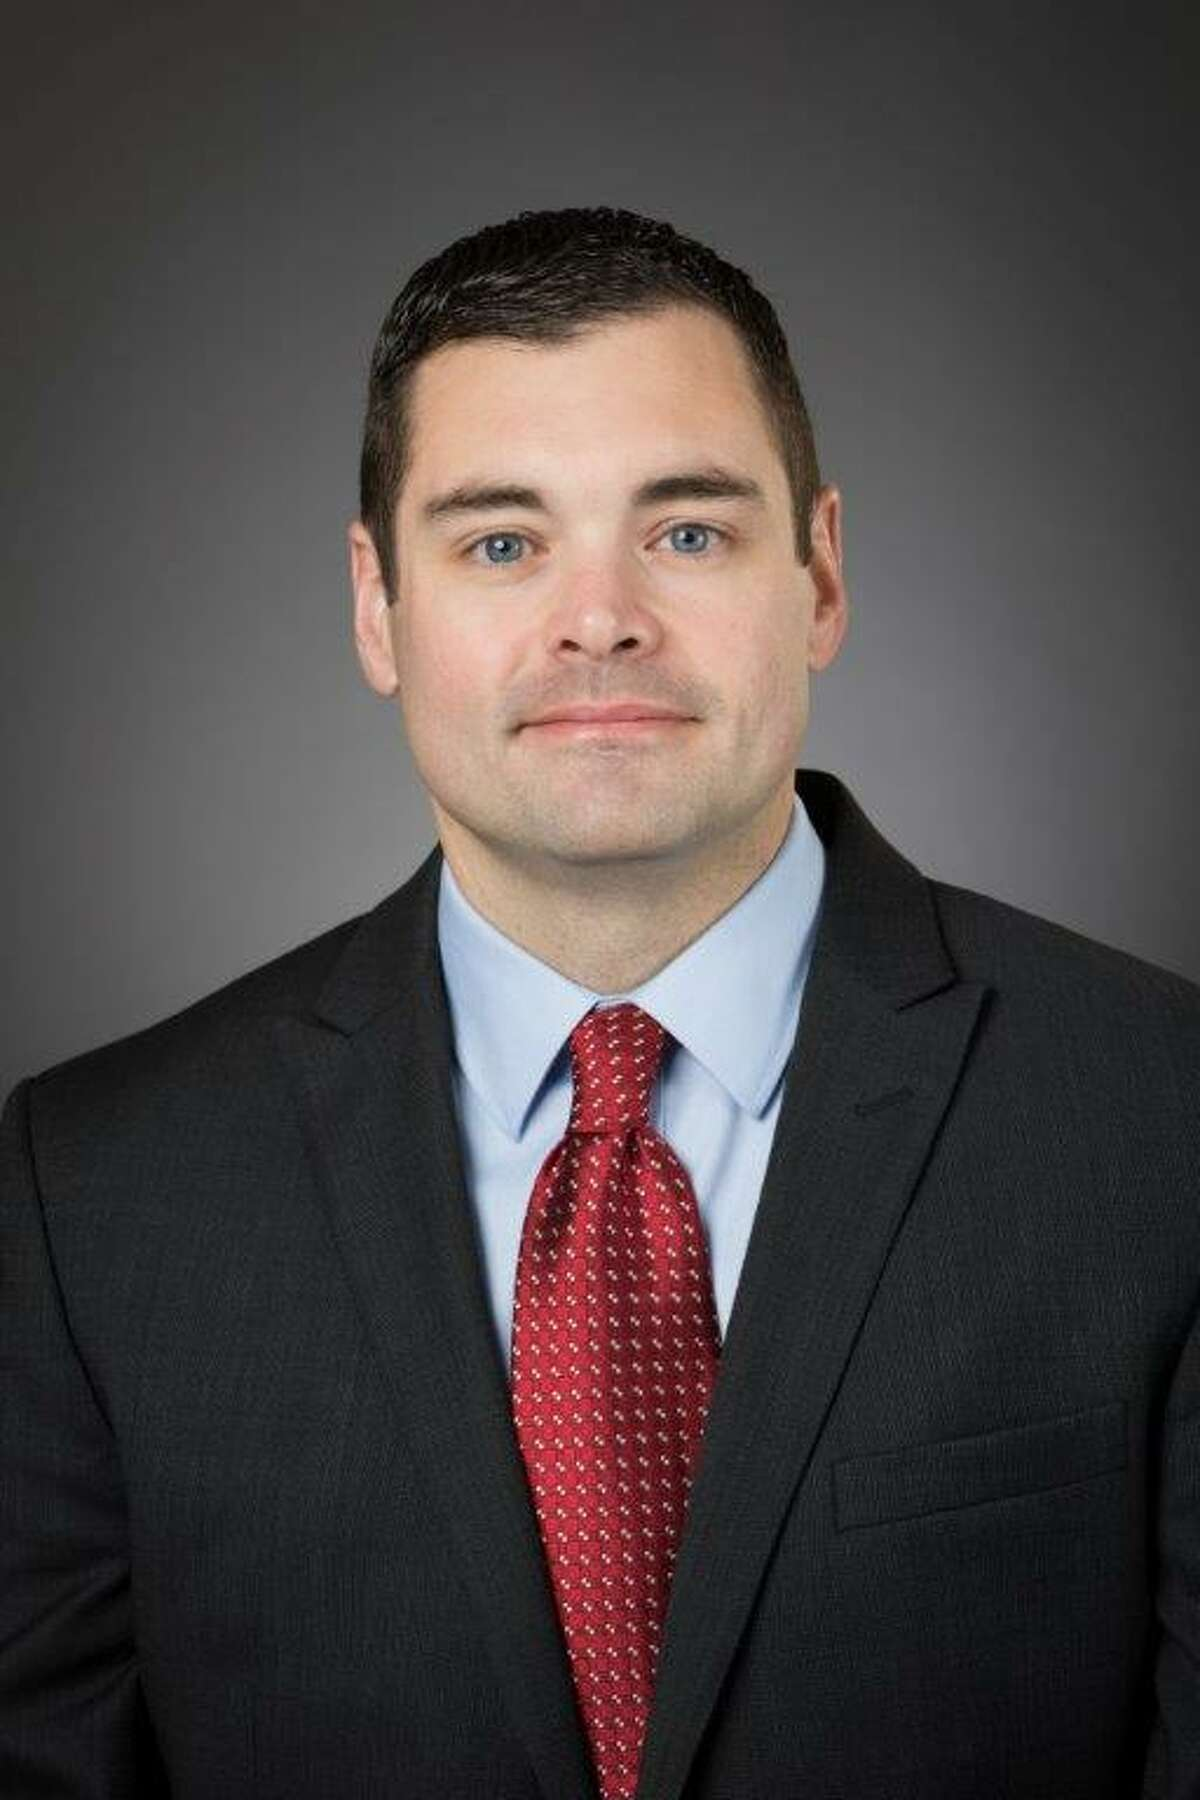 Kit Bredimus, Vice President of Nursing at Midland Health